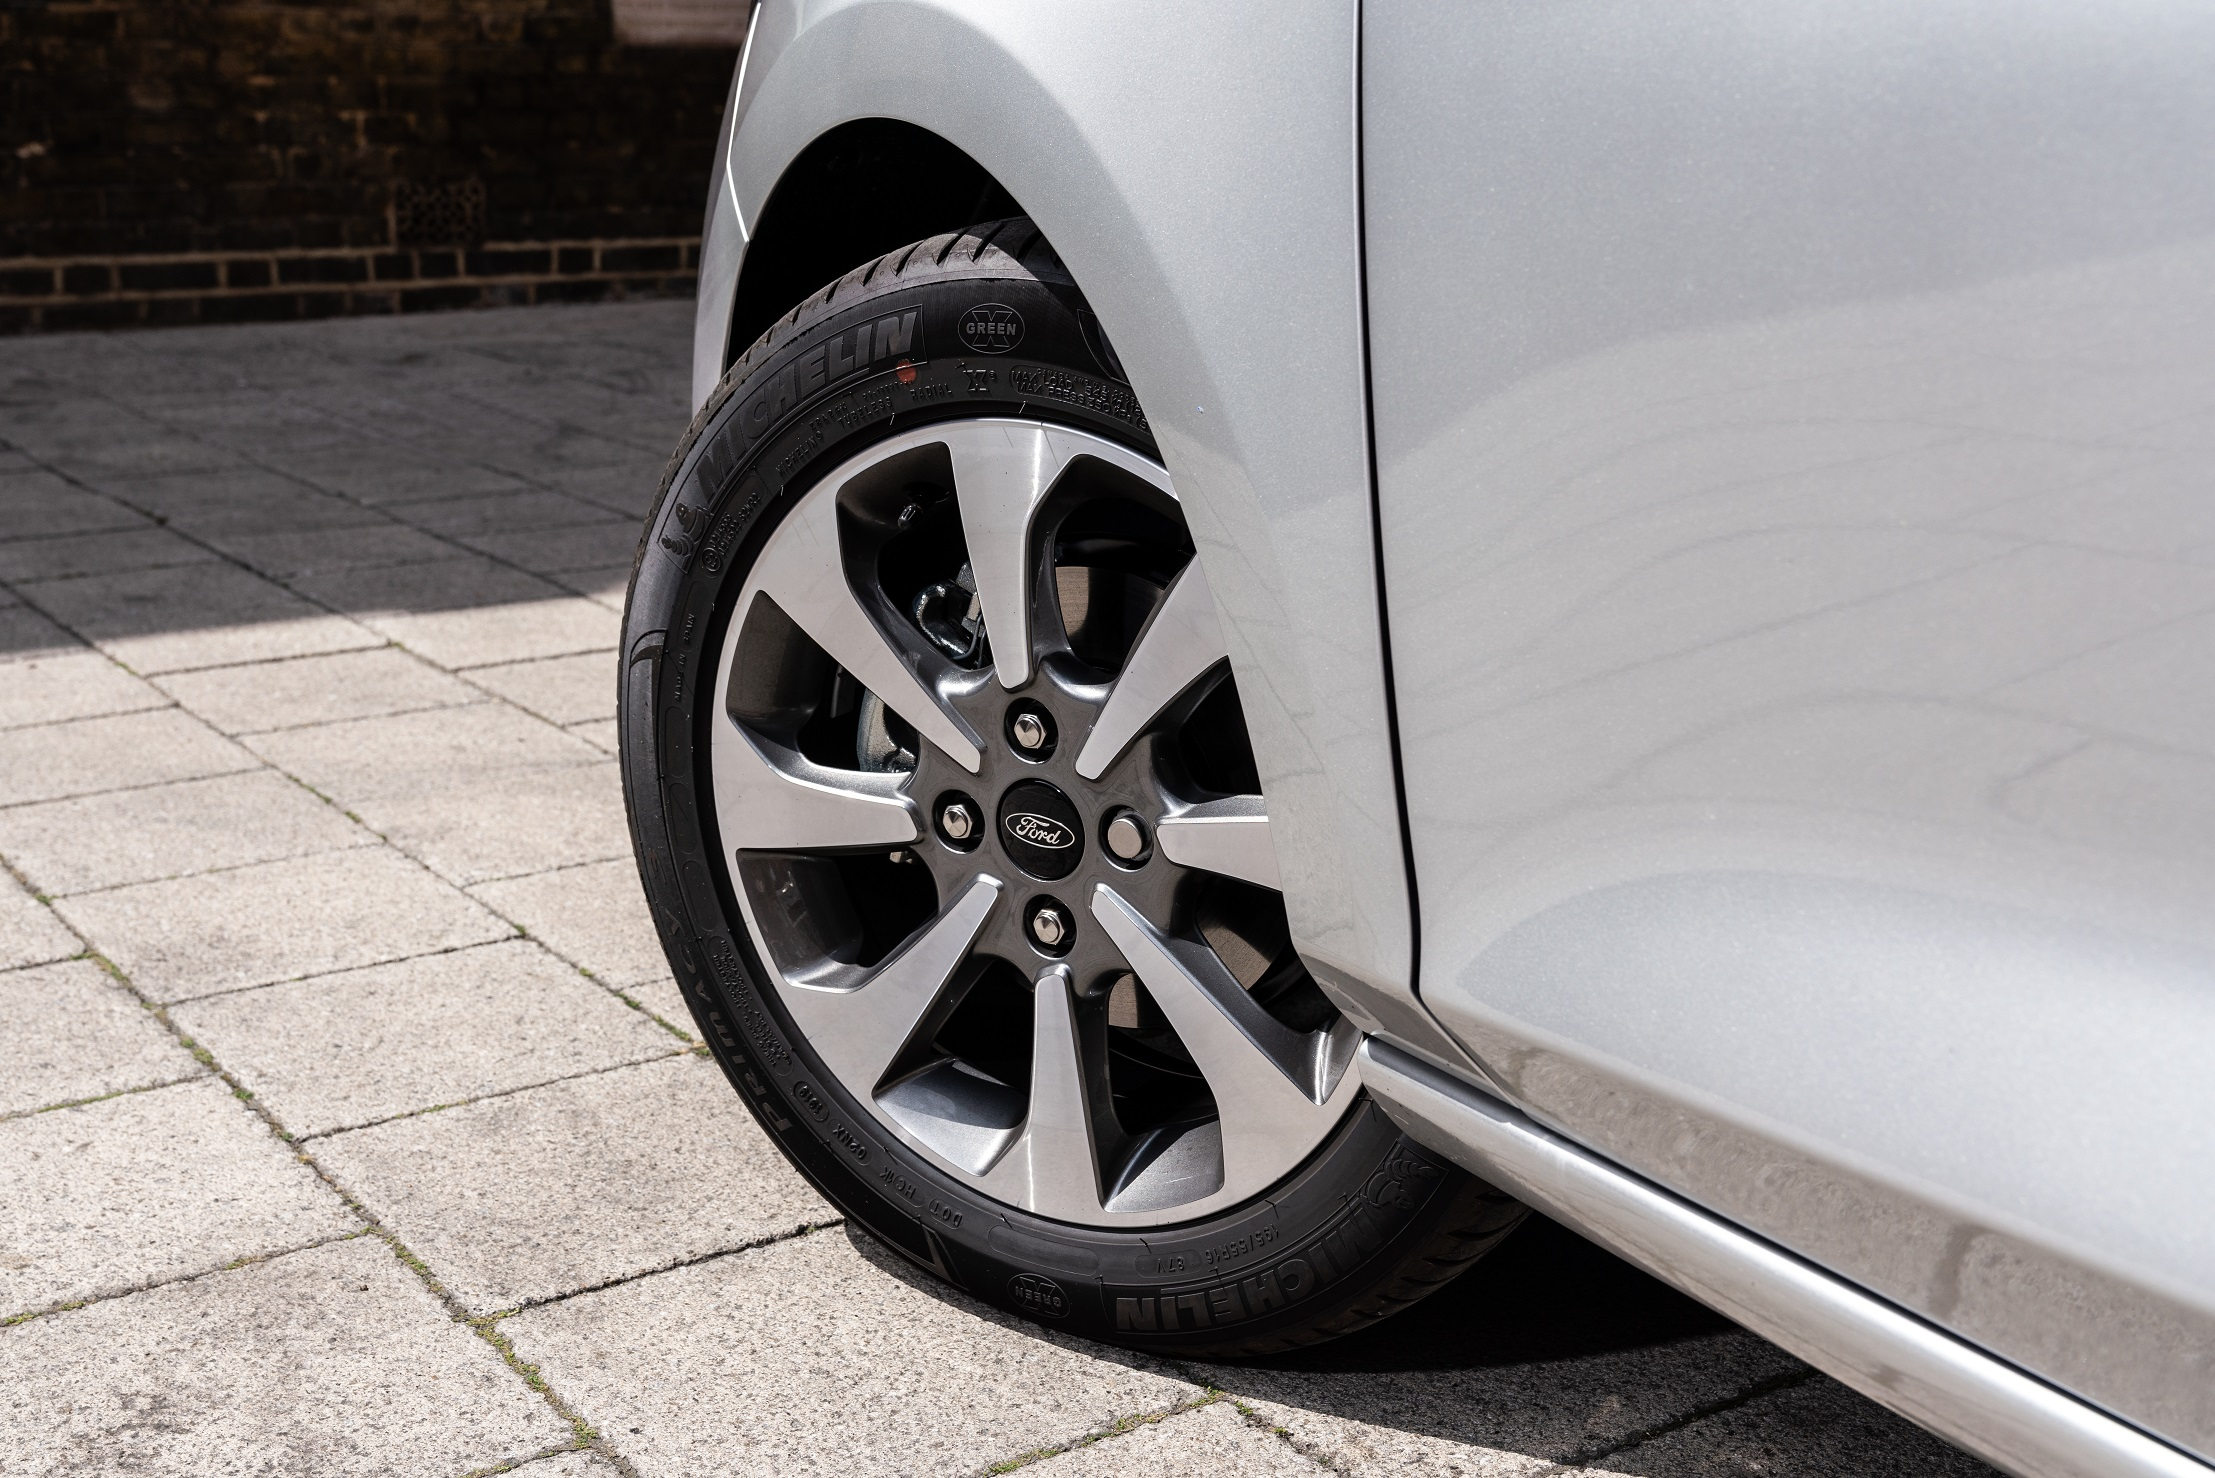 Fiesta Trend wheel detail